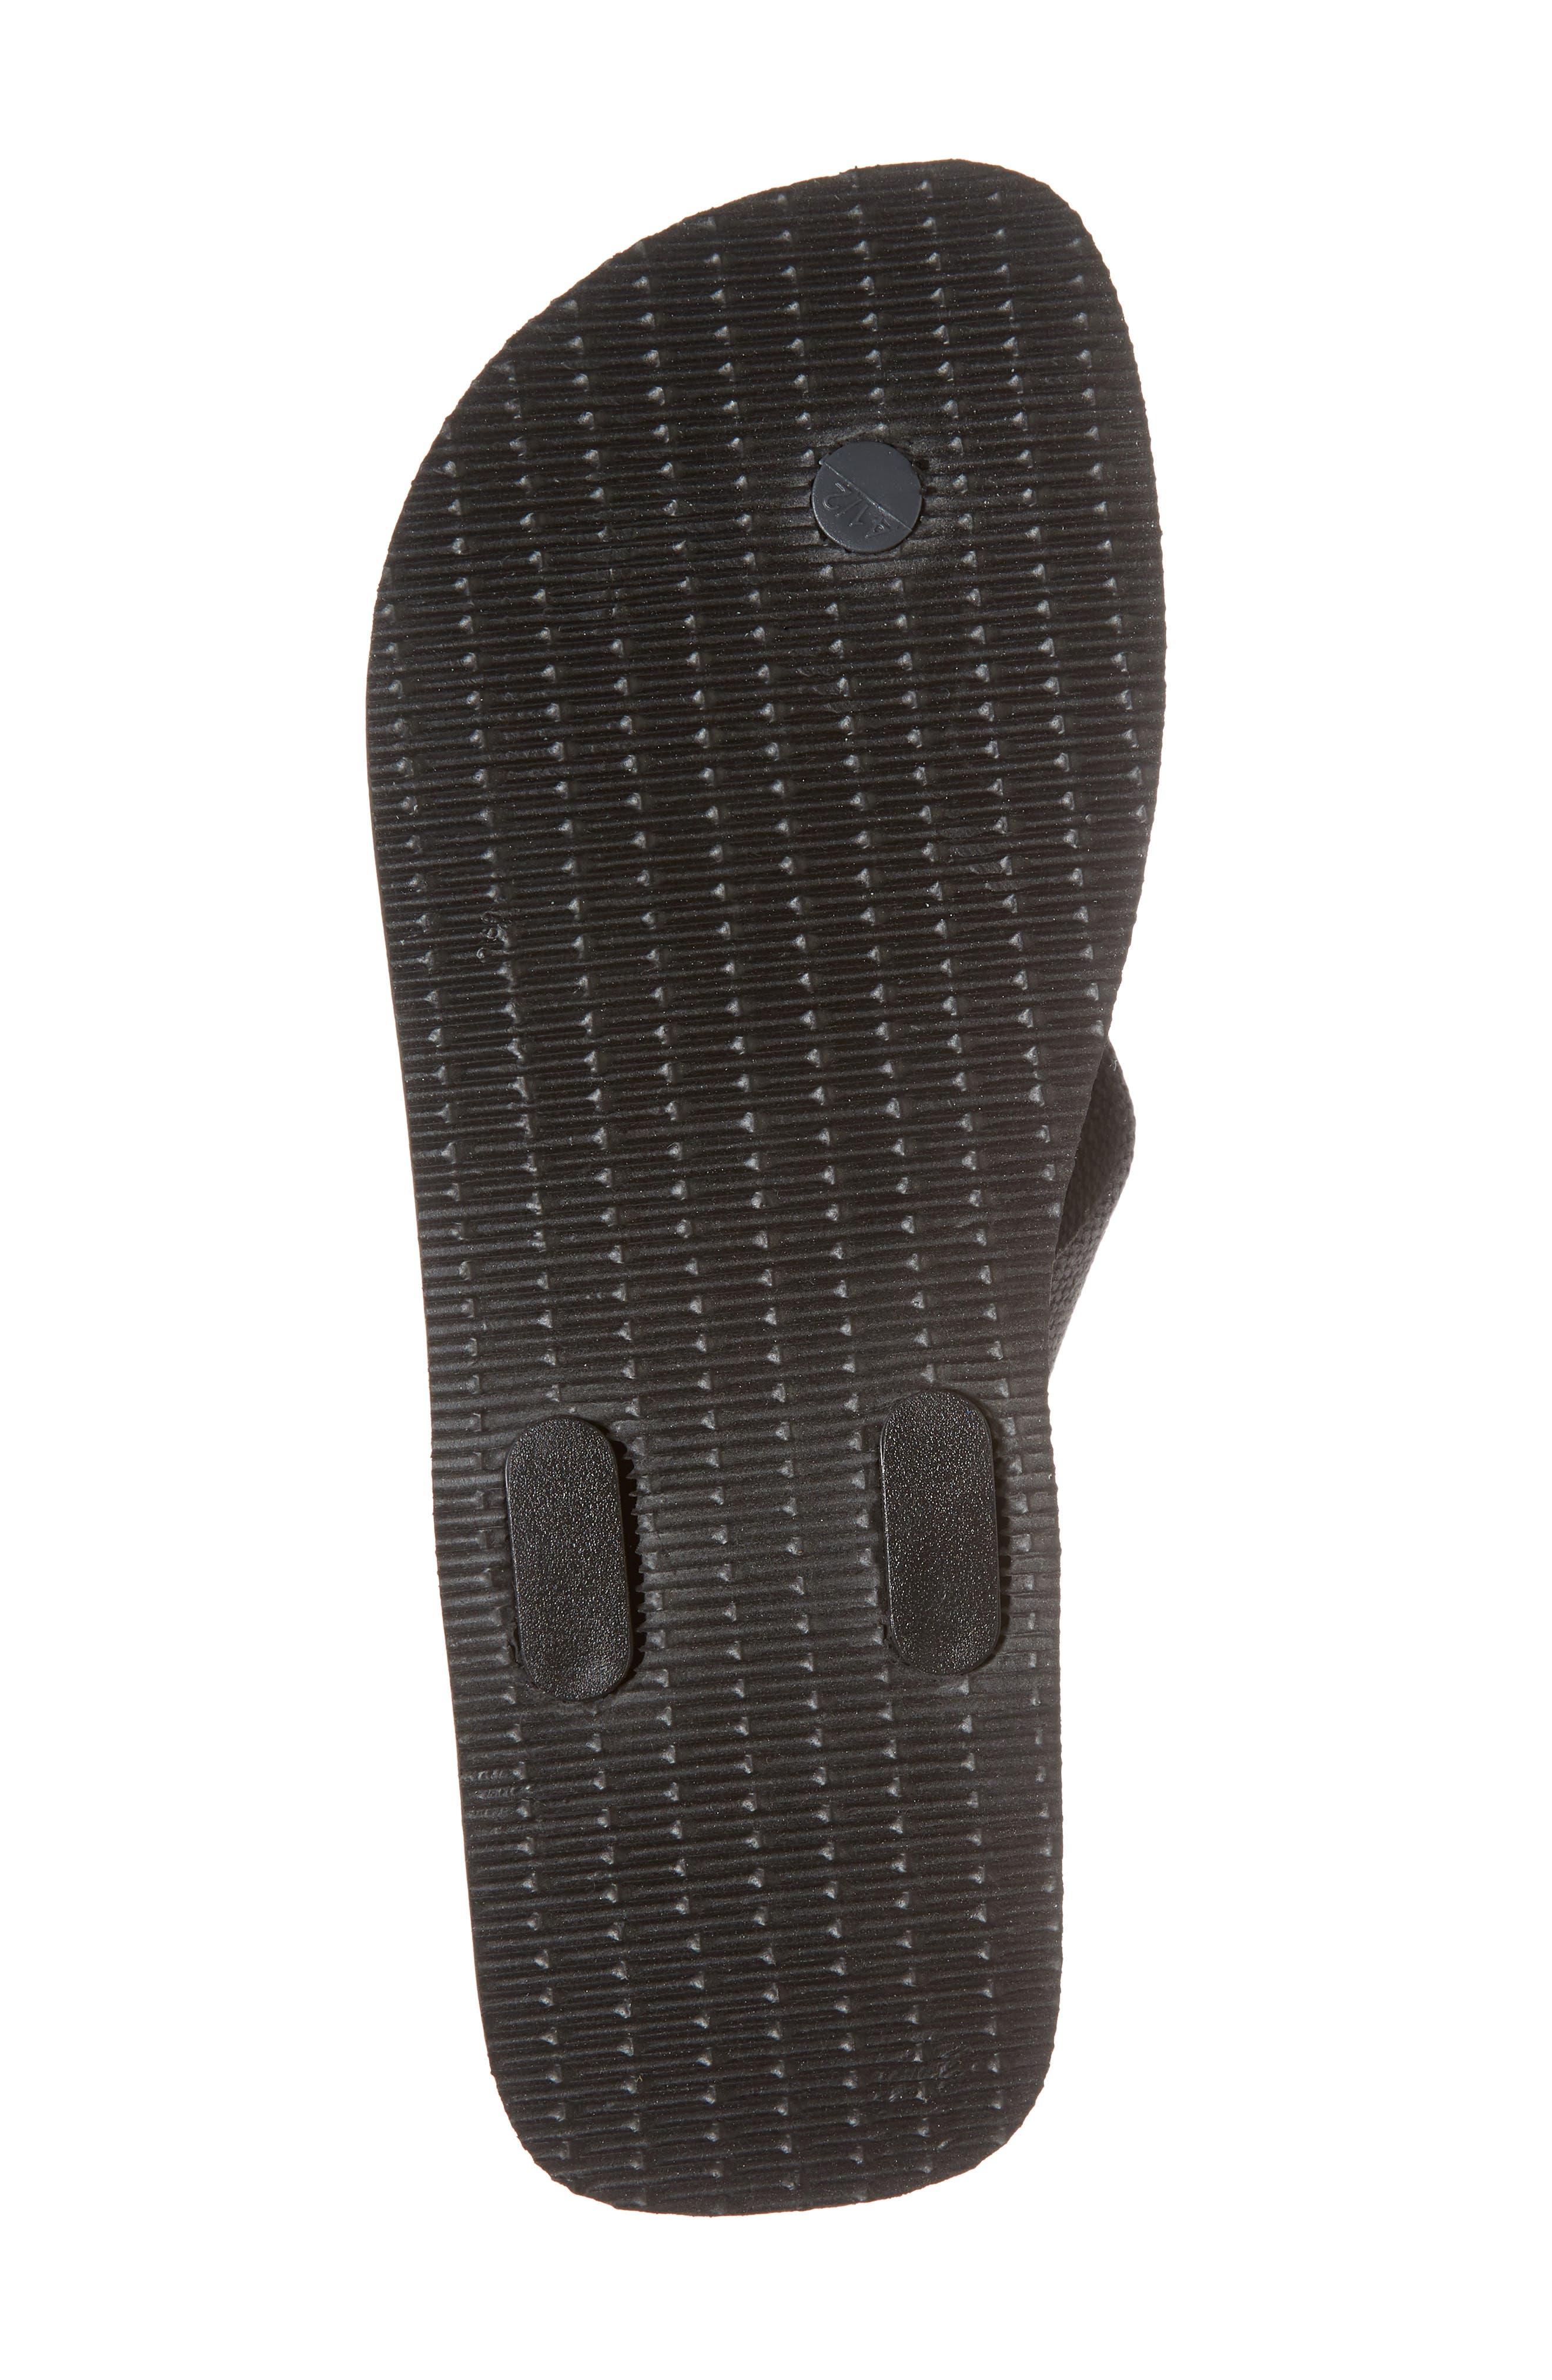 Havianas 'Urban Basic' Flip Flop,                             Alternate thumbnail 6, color,                             Black/ Grey